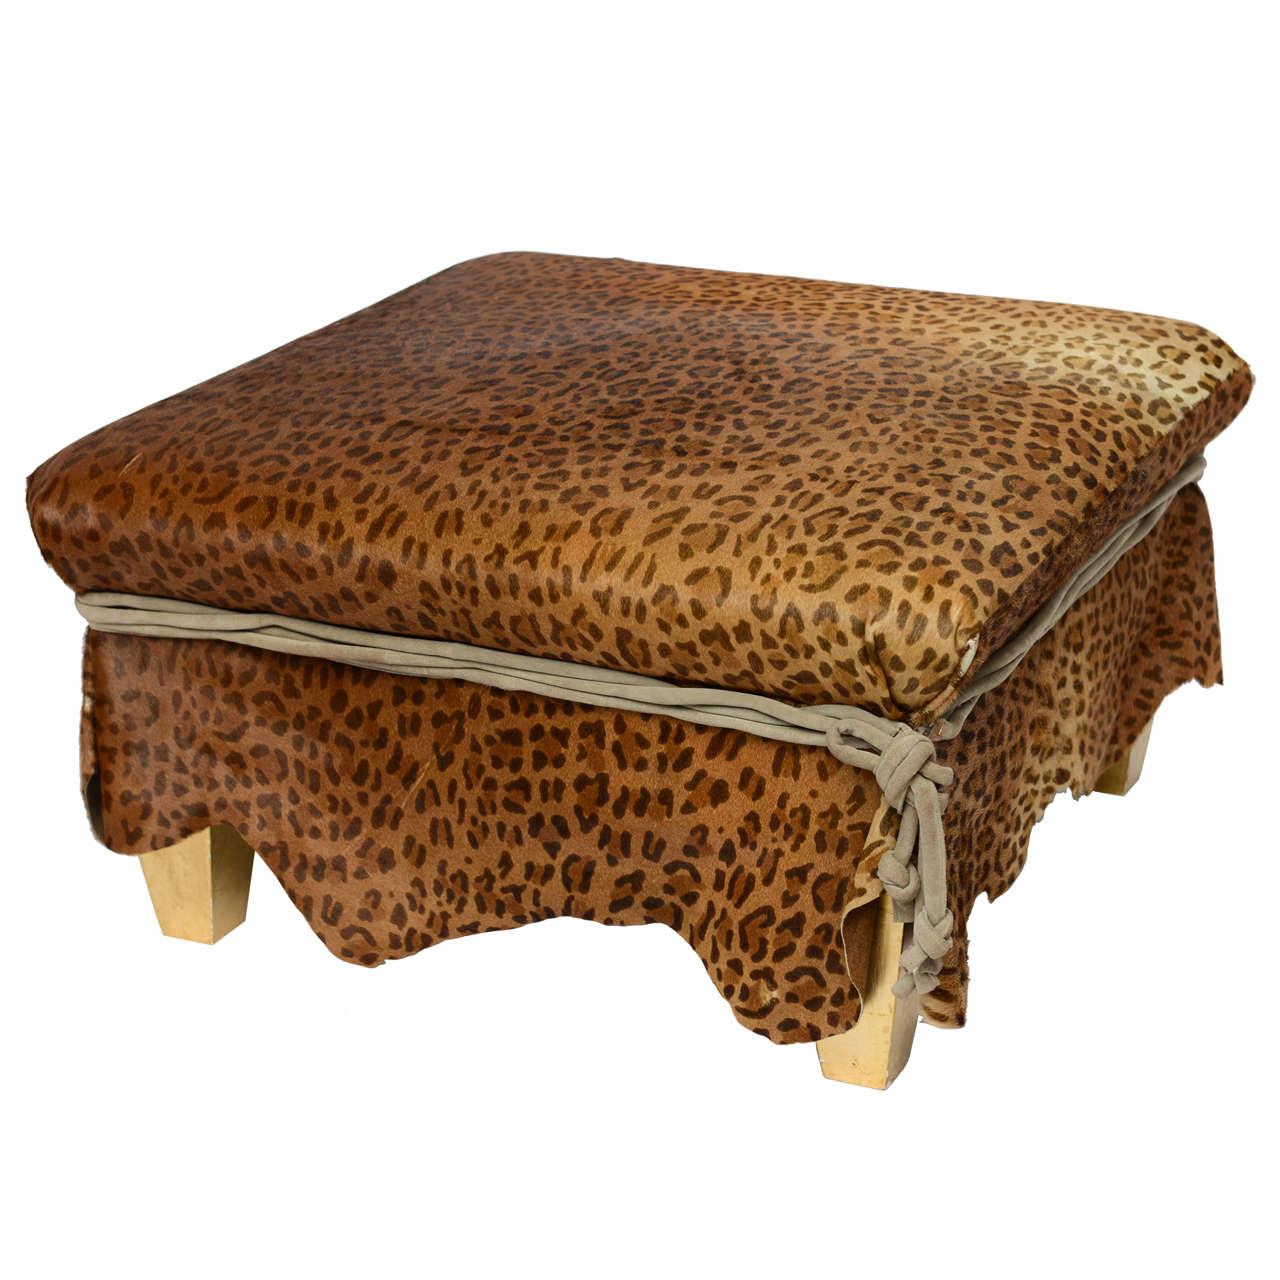 Ronn Jaffe Leopard Calf Hair Ottoman Cocktail Table